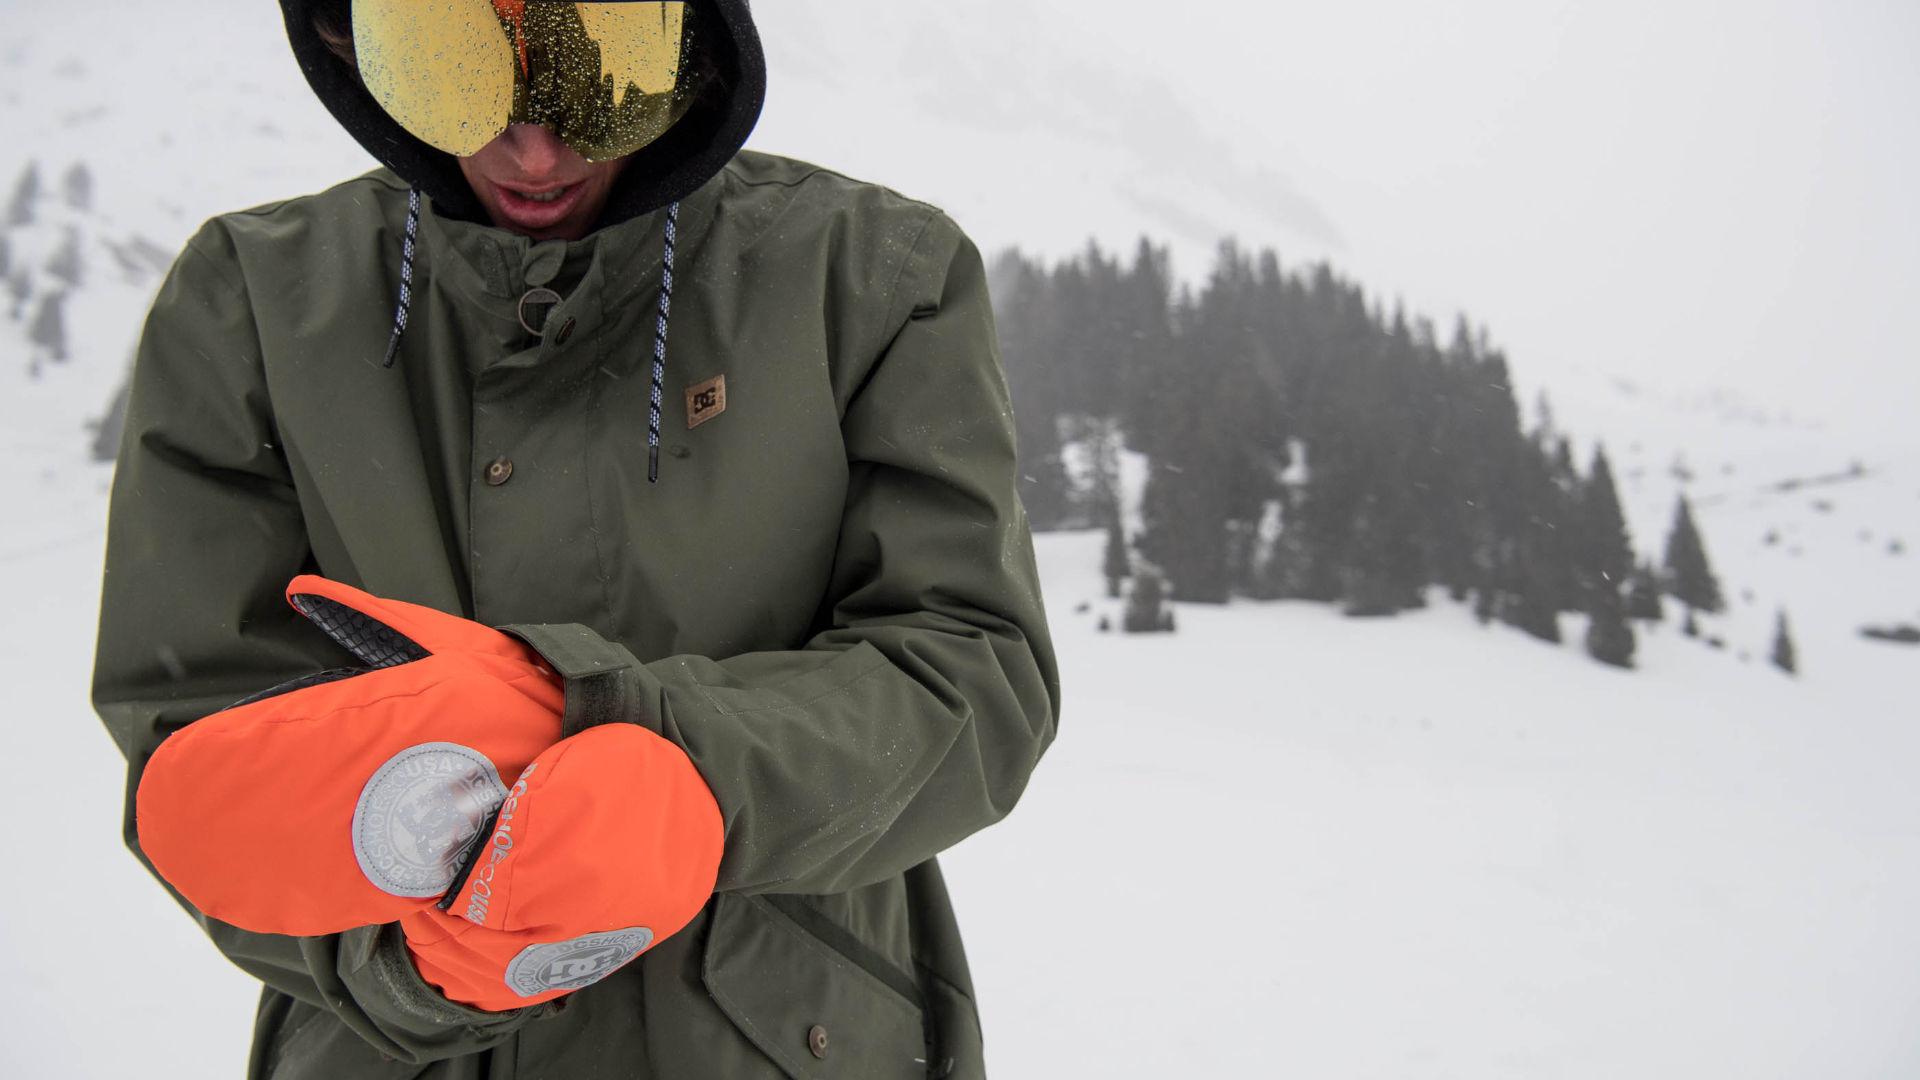 a snowboarder adjusting his bright orange mittens